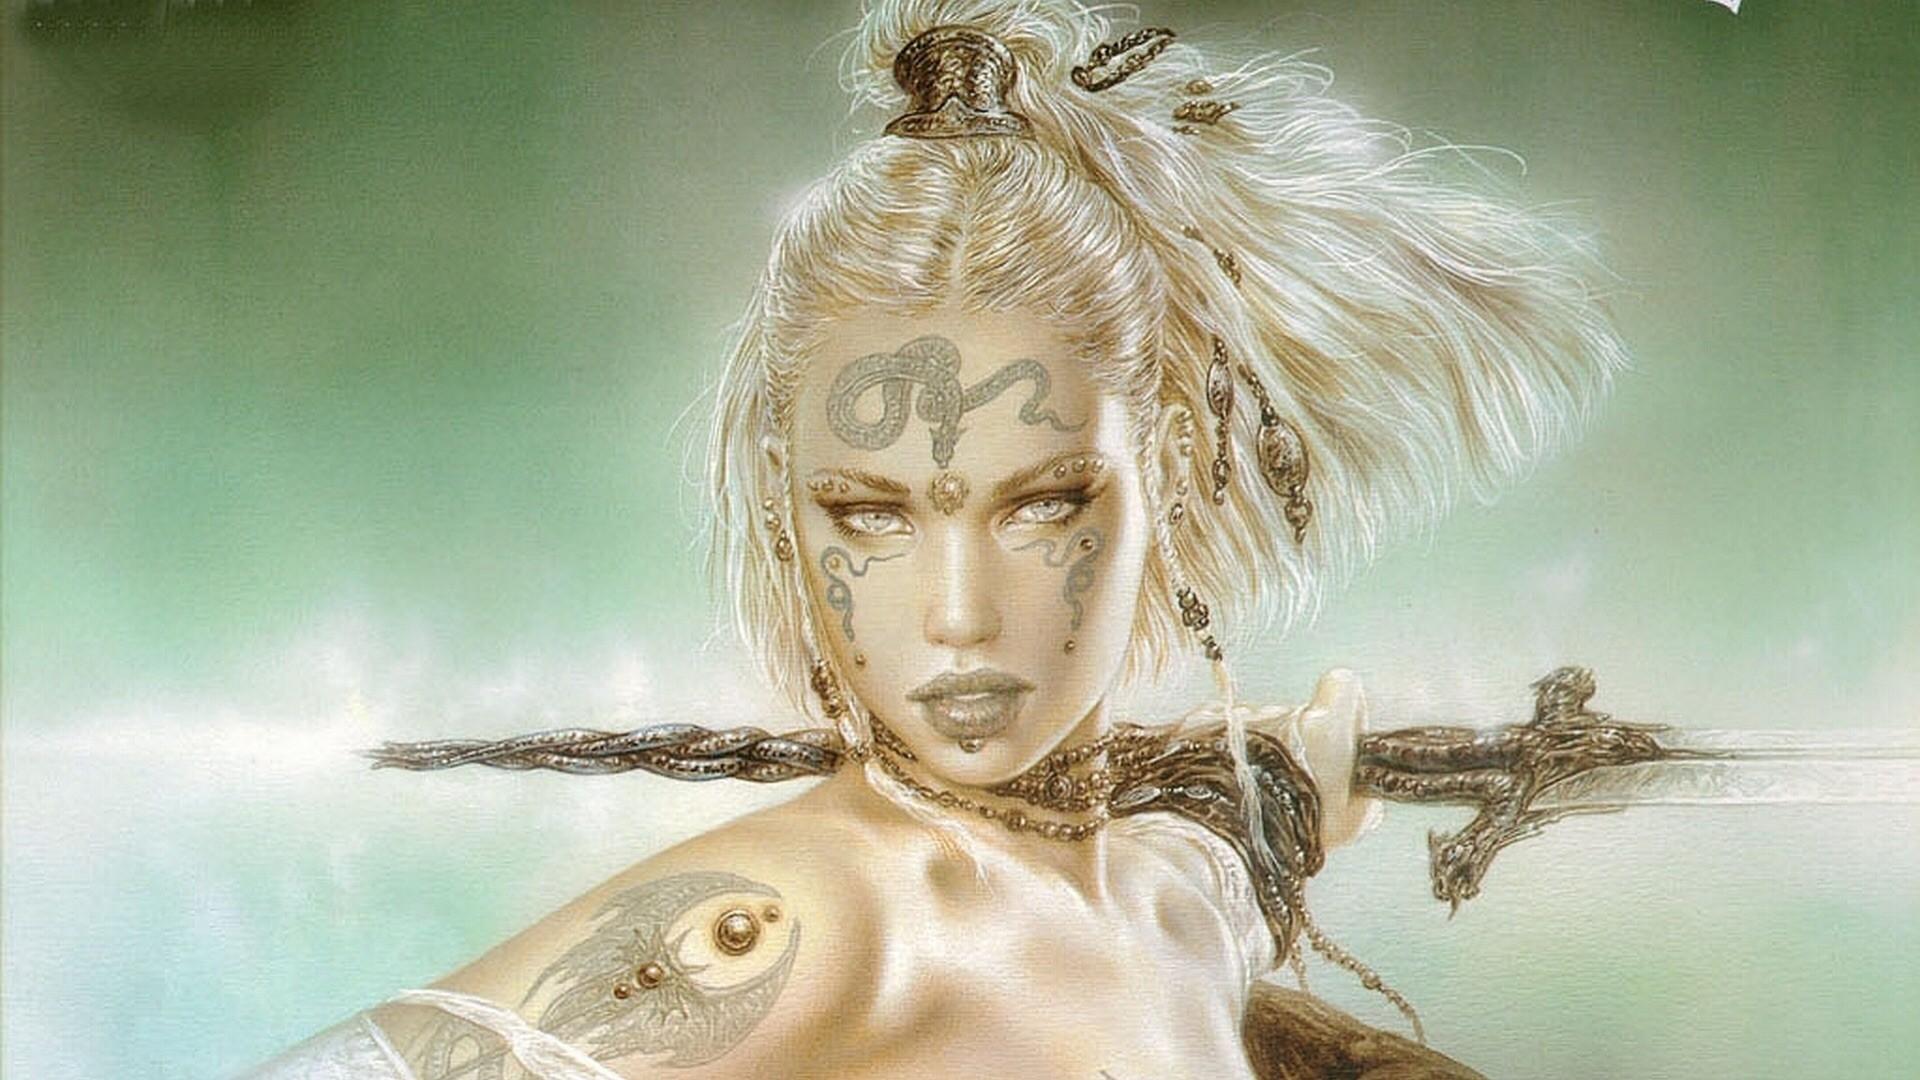 drawing fantasy art Luis Royo mythology sketch computer wallpaper fictional character woman warrior